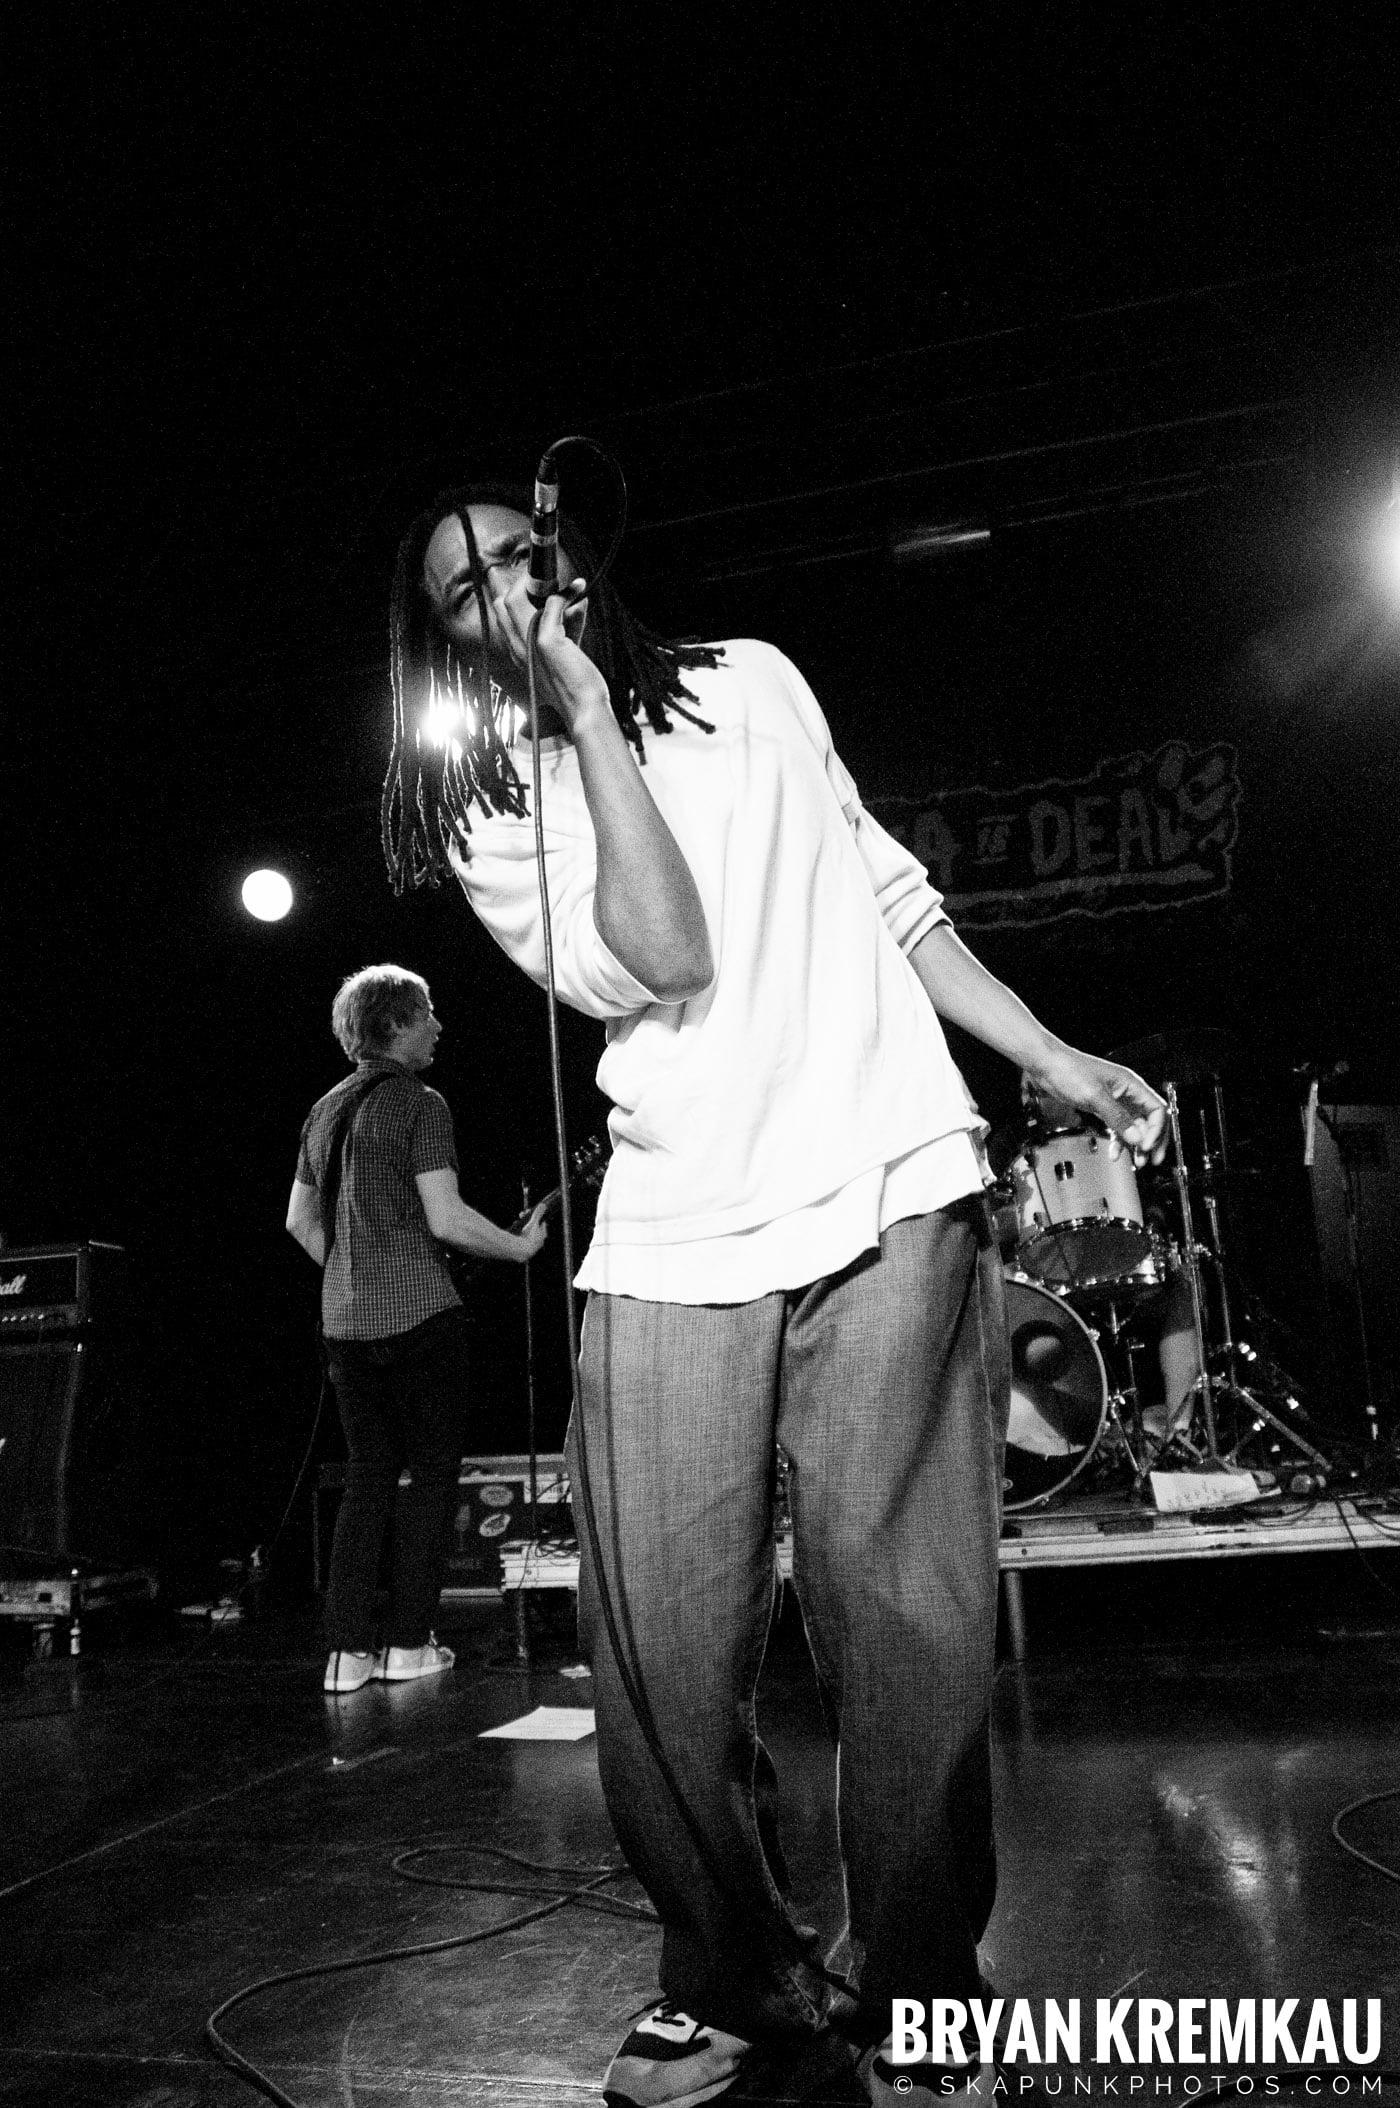 Pilfers (Ska is Dead Tour) @ Starland Ballroom, Sayreville, NJ - 11.15.09 (17)